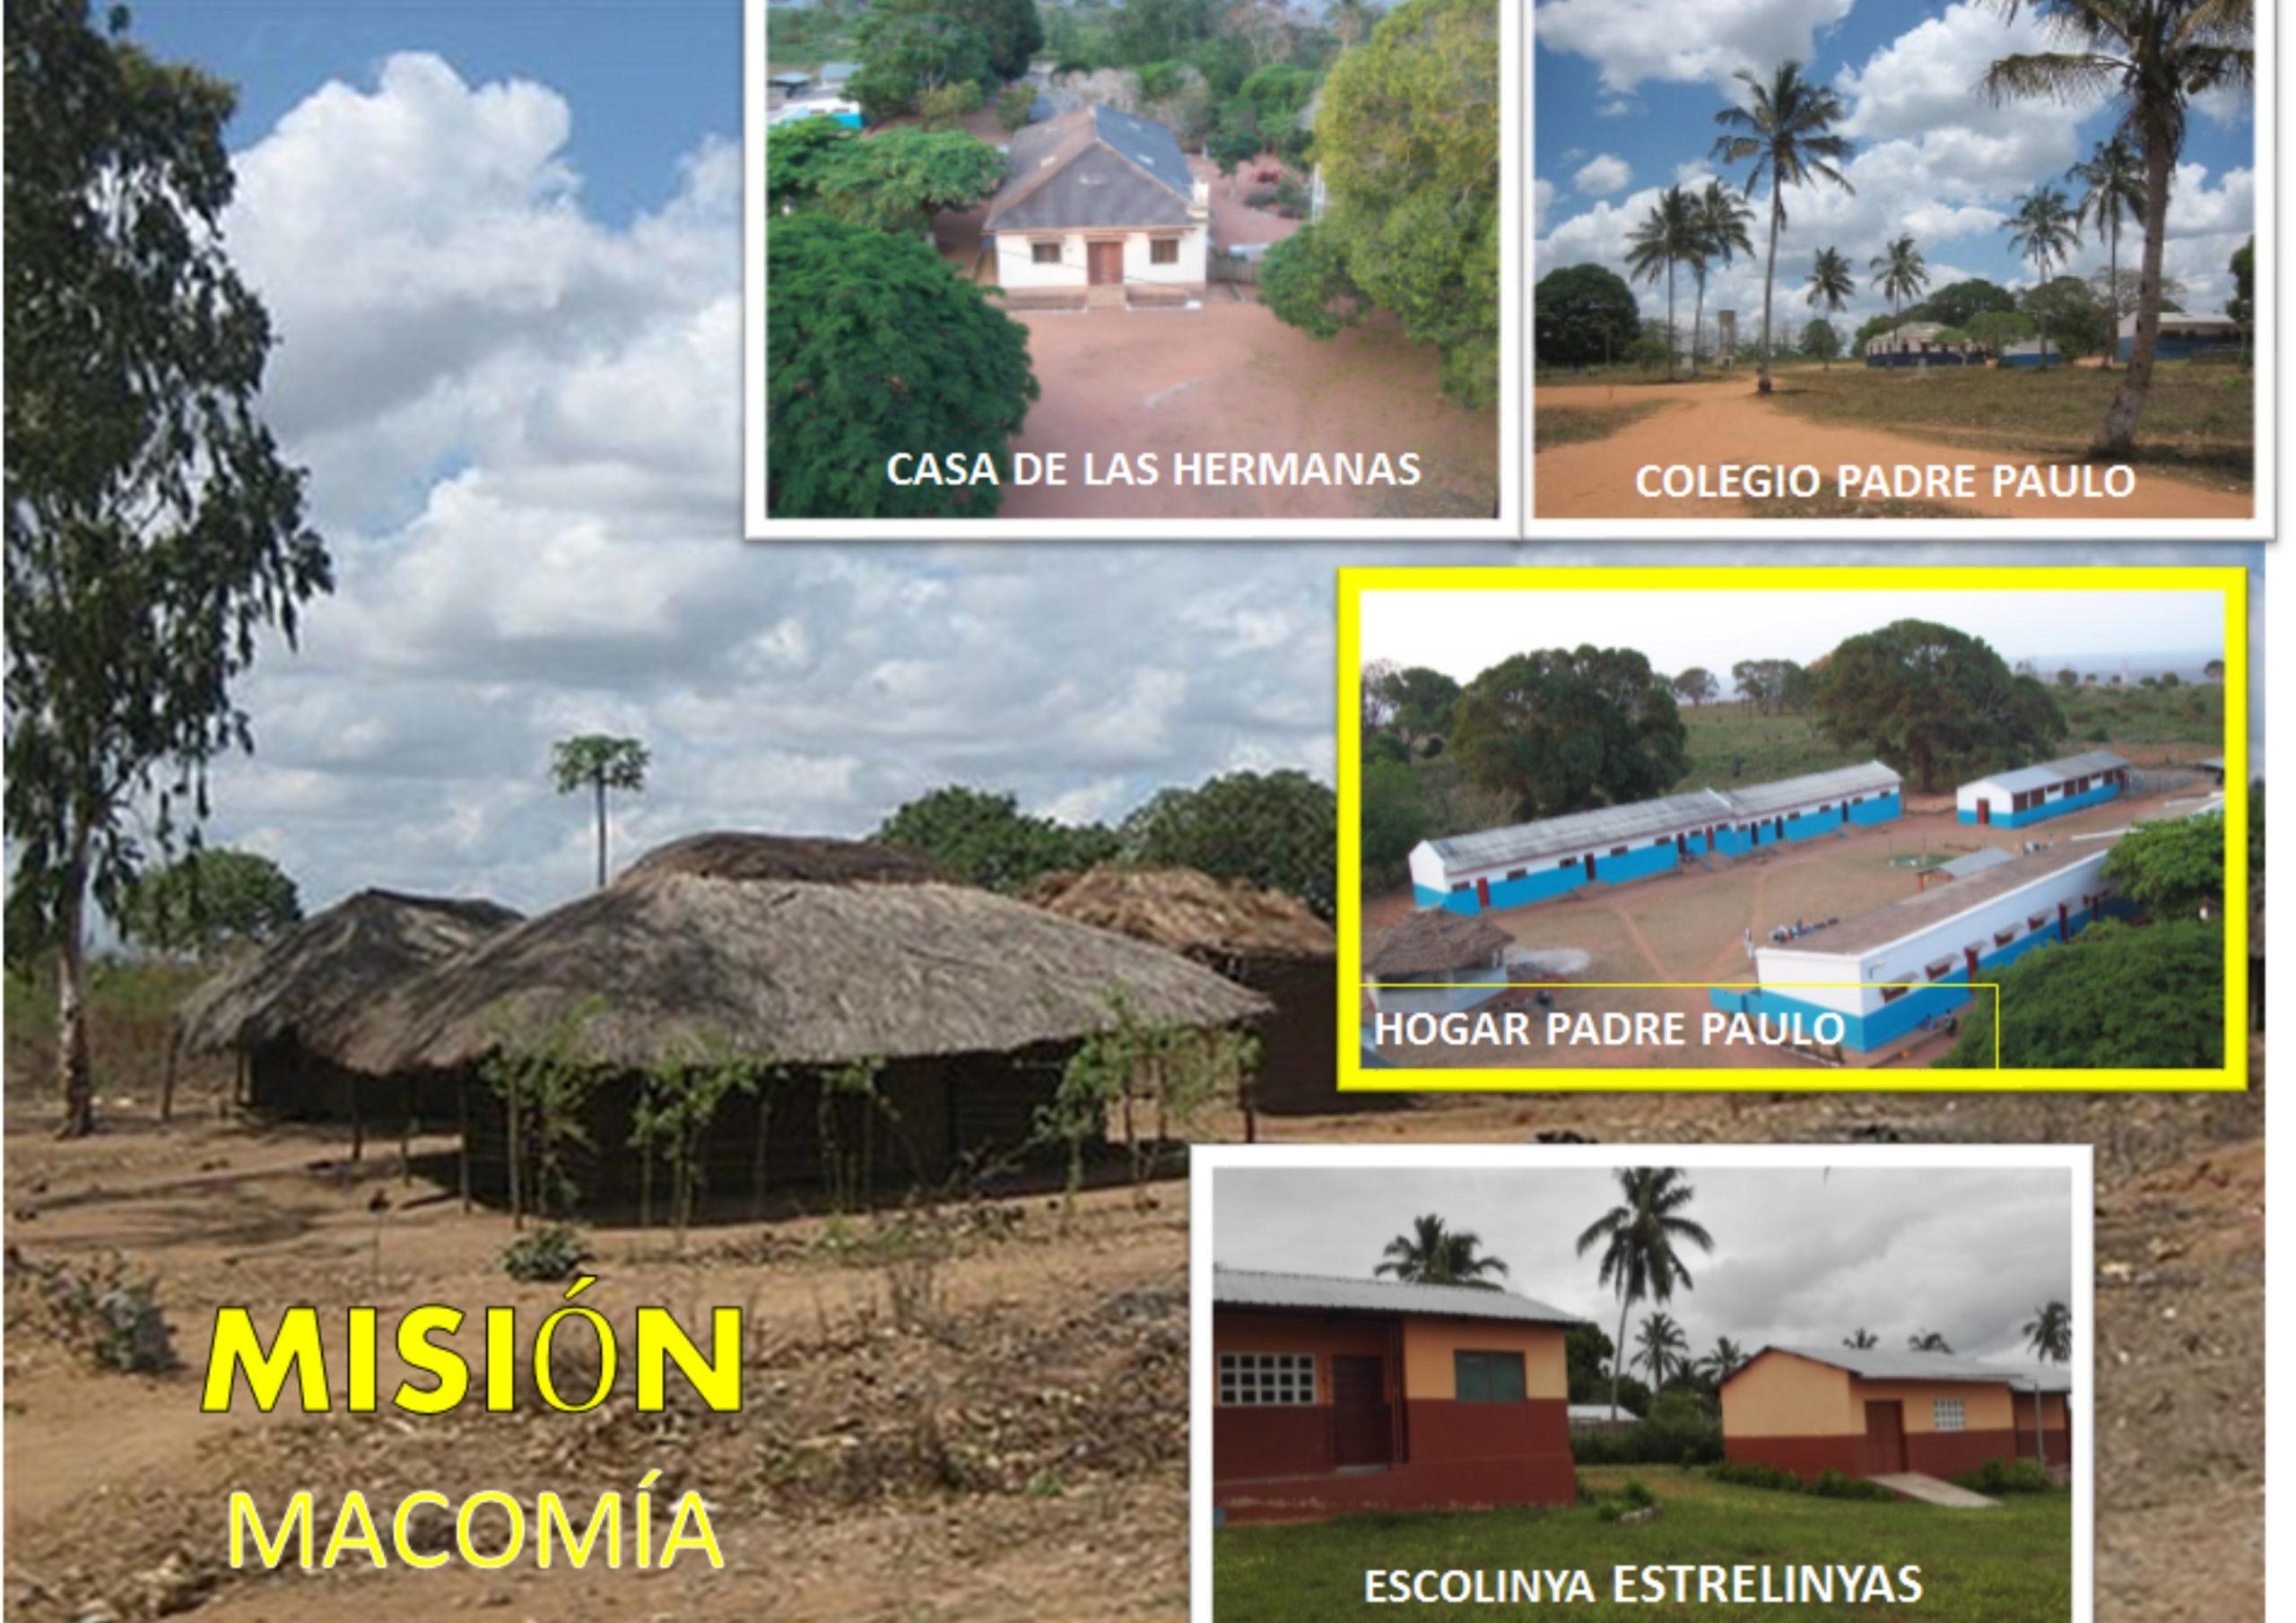 Escuela Secundaria Padre Paulo - Hogar Padre Paulo – Escolinya Estrelinyas